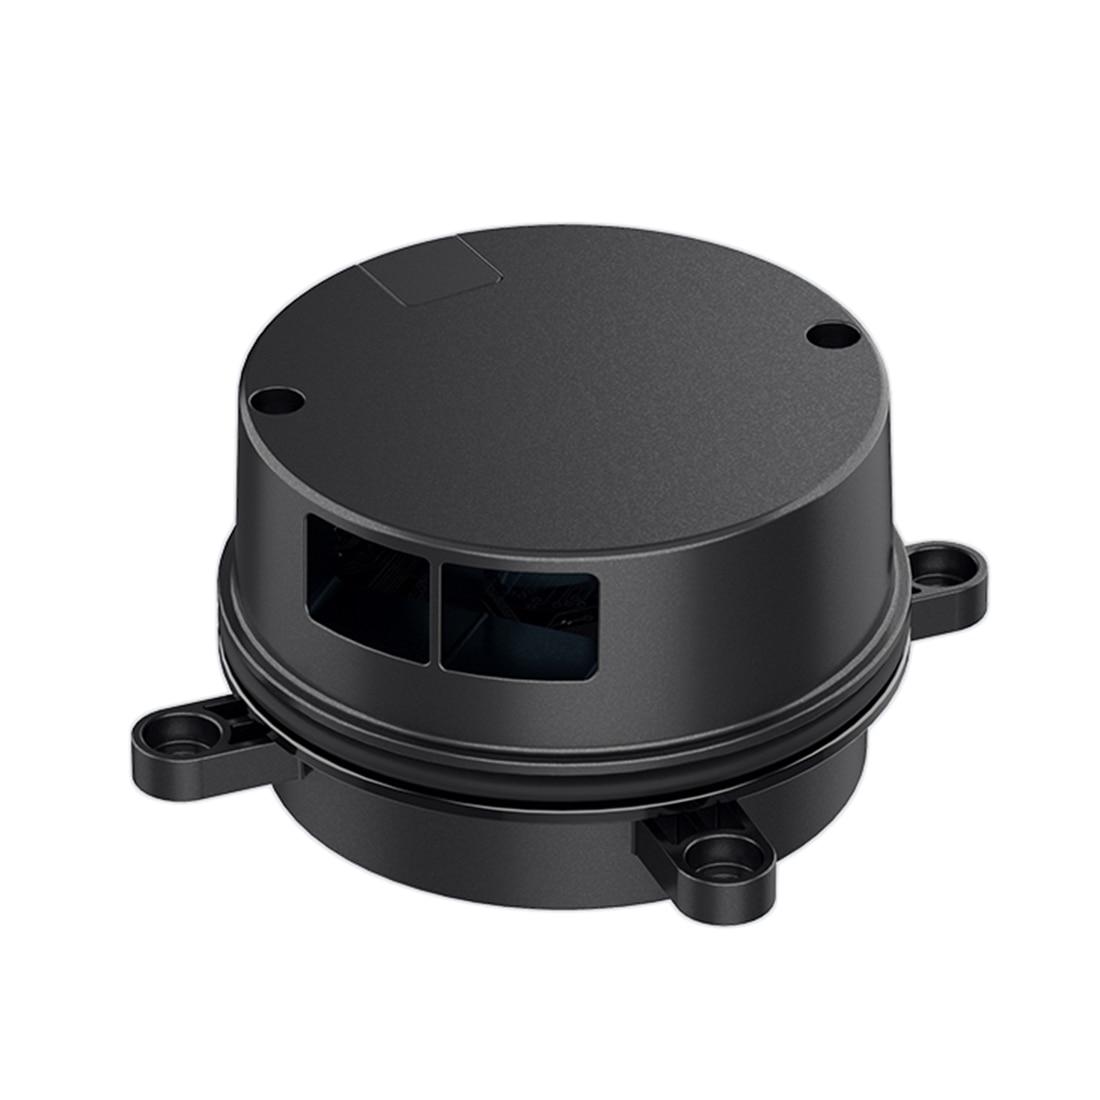 LiDAR 3i-2T Outdoor Radar Scanner GPS Path Planning Obstacle Avoidance Large Screen Interactive Distance Measuring Sensor